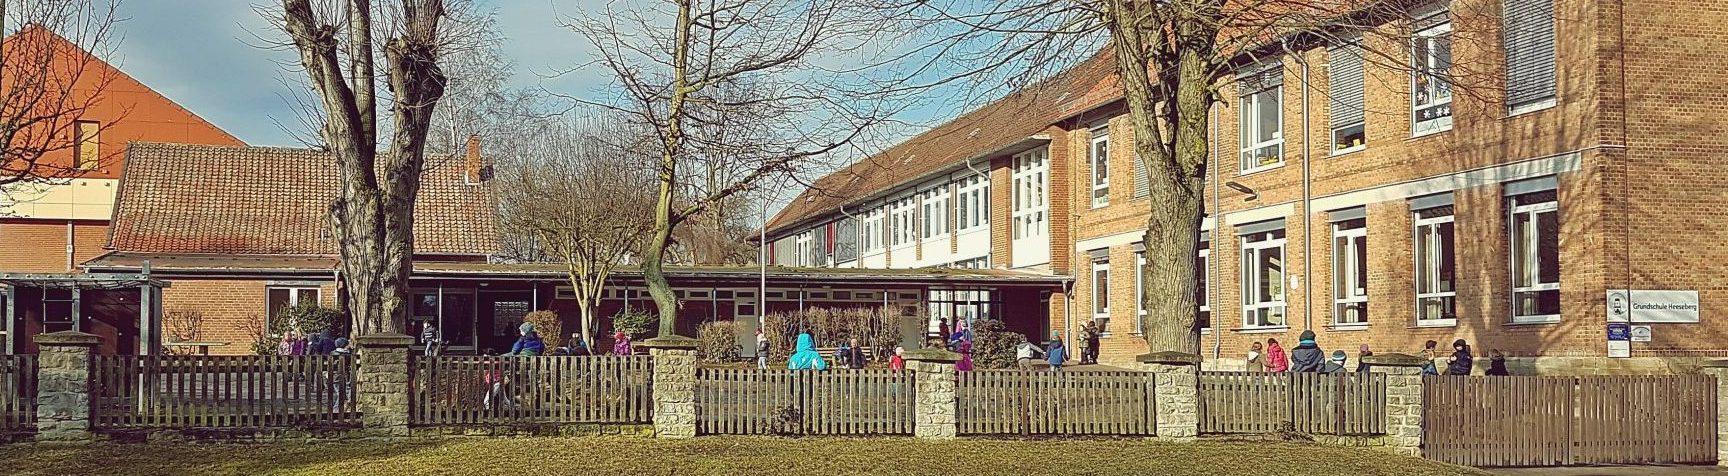 Grundschule Heeseberg